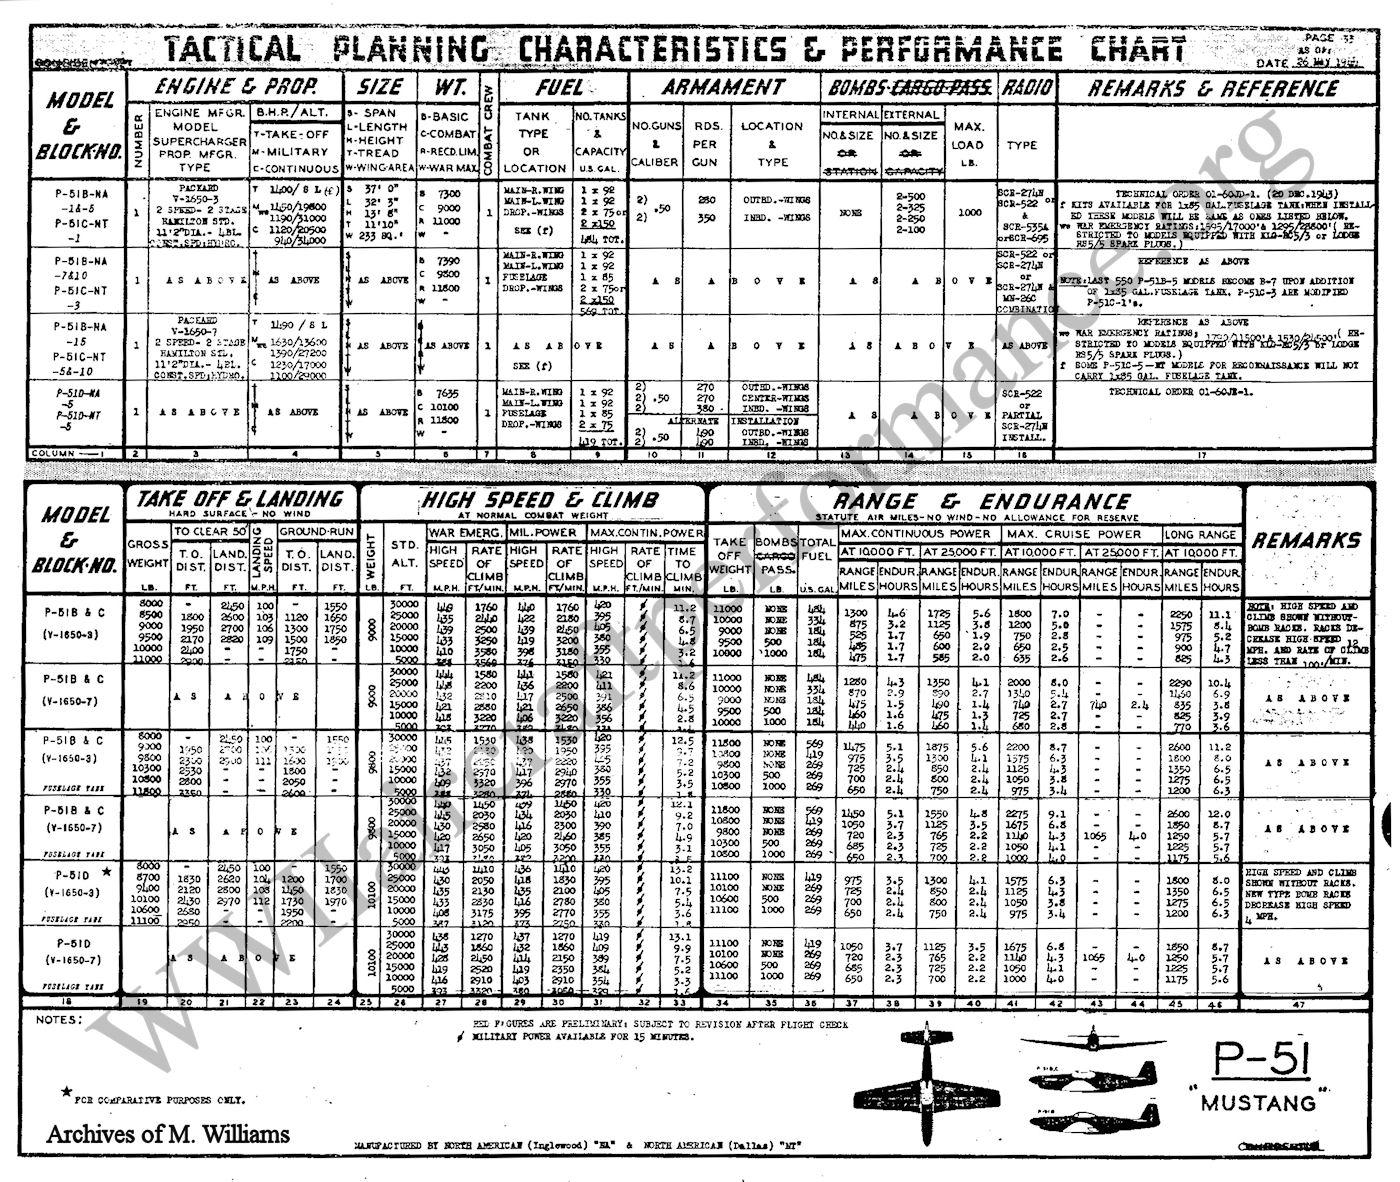 p-51-tactical-chart.jpg